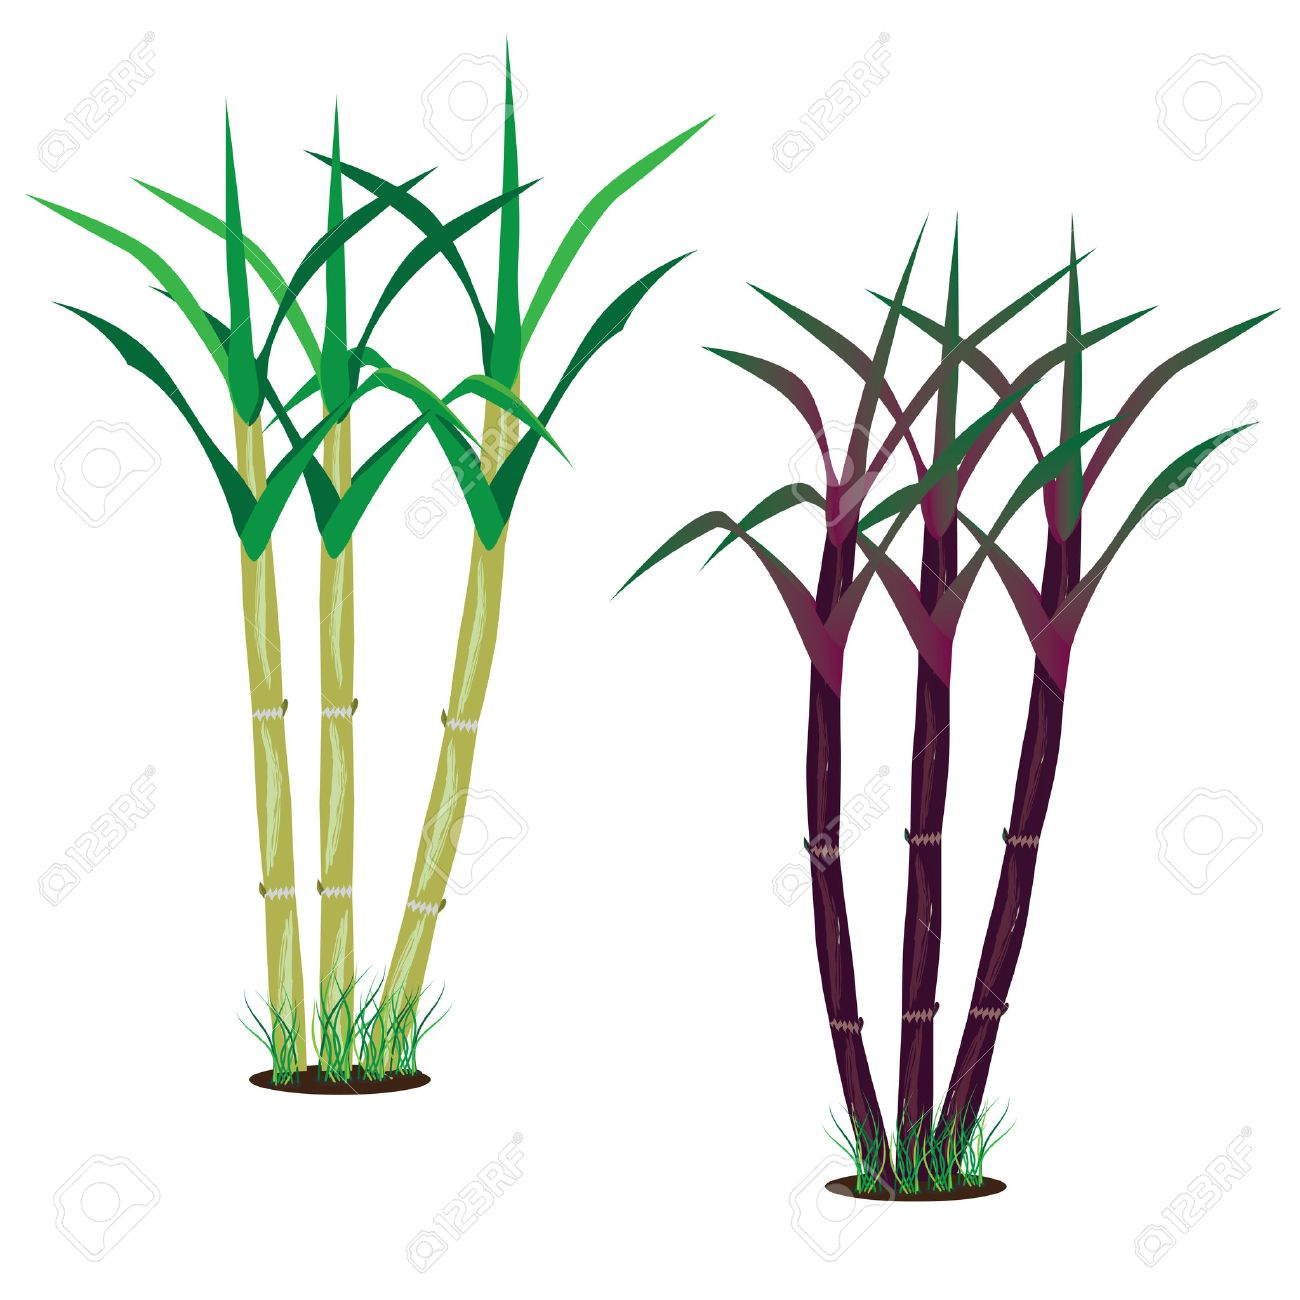 sugarcane vector design royalty free cliparts vectors and stock rh 123rf com images of sugarcane clipart sugar cane clipart black and white